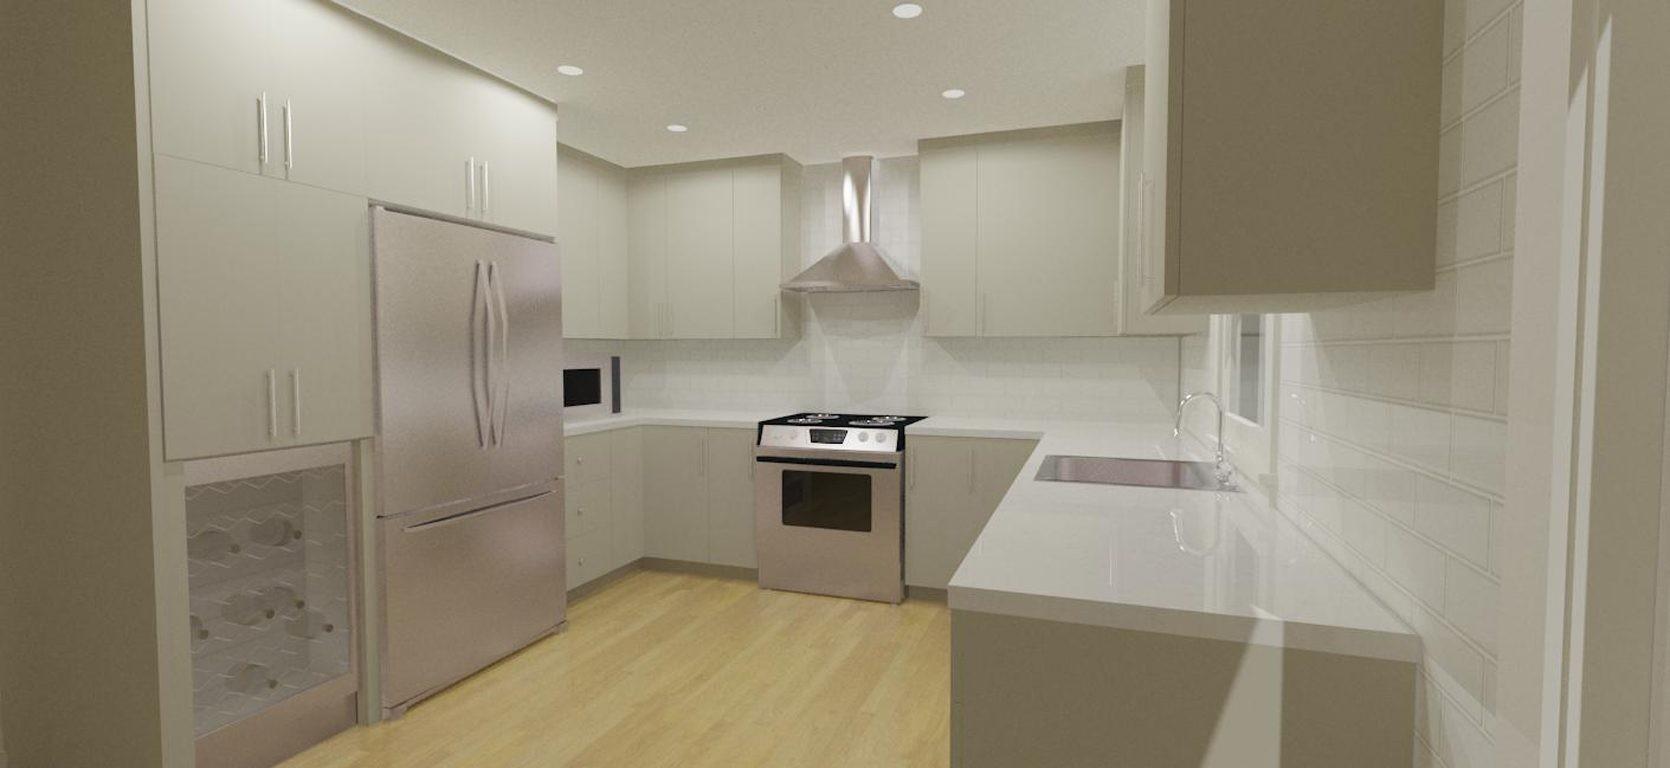 Casa Reno Direct Contemporary Style Kitchen 10x10 In